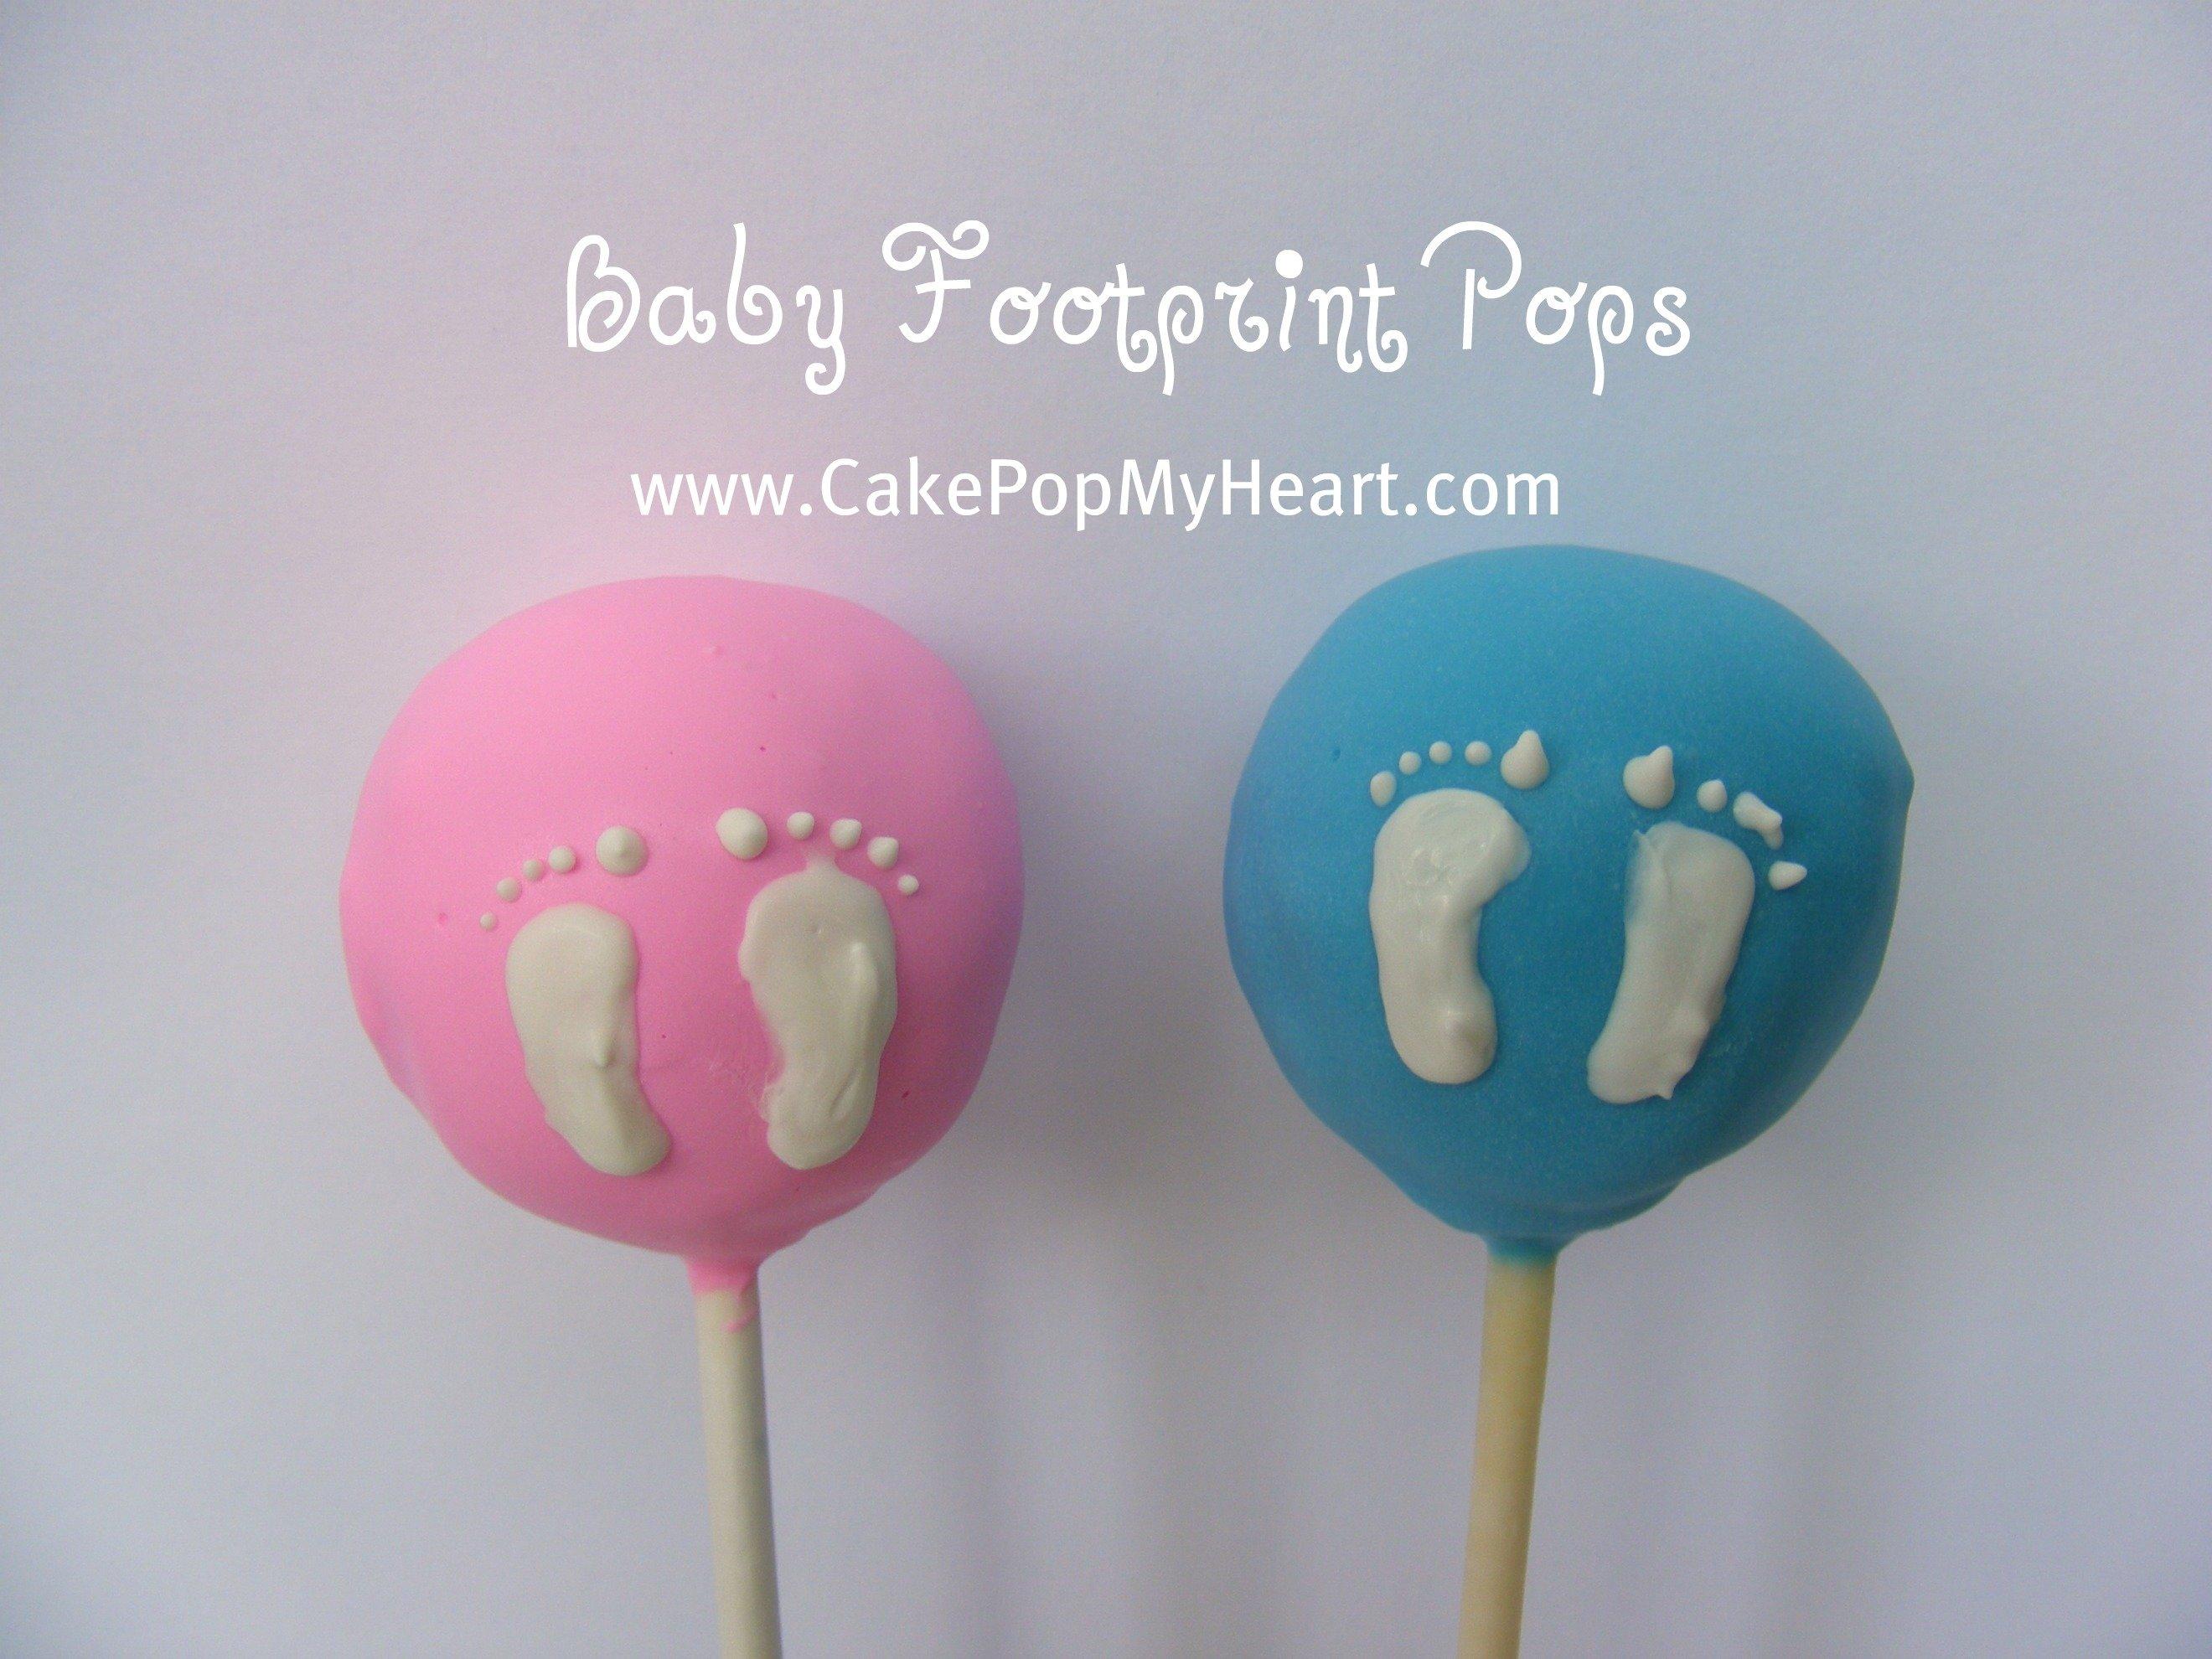 10 Nice Baby Shower Cake Pop Ideas baby shower cake pops boy unique baby shower cake pops cake pop my 1 2021